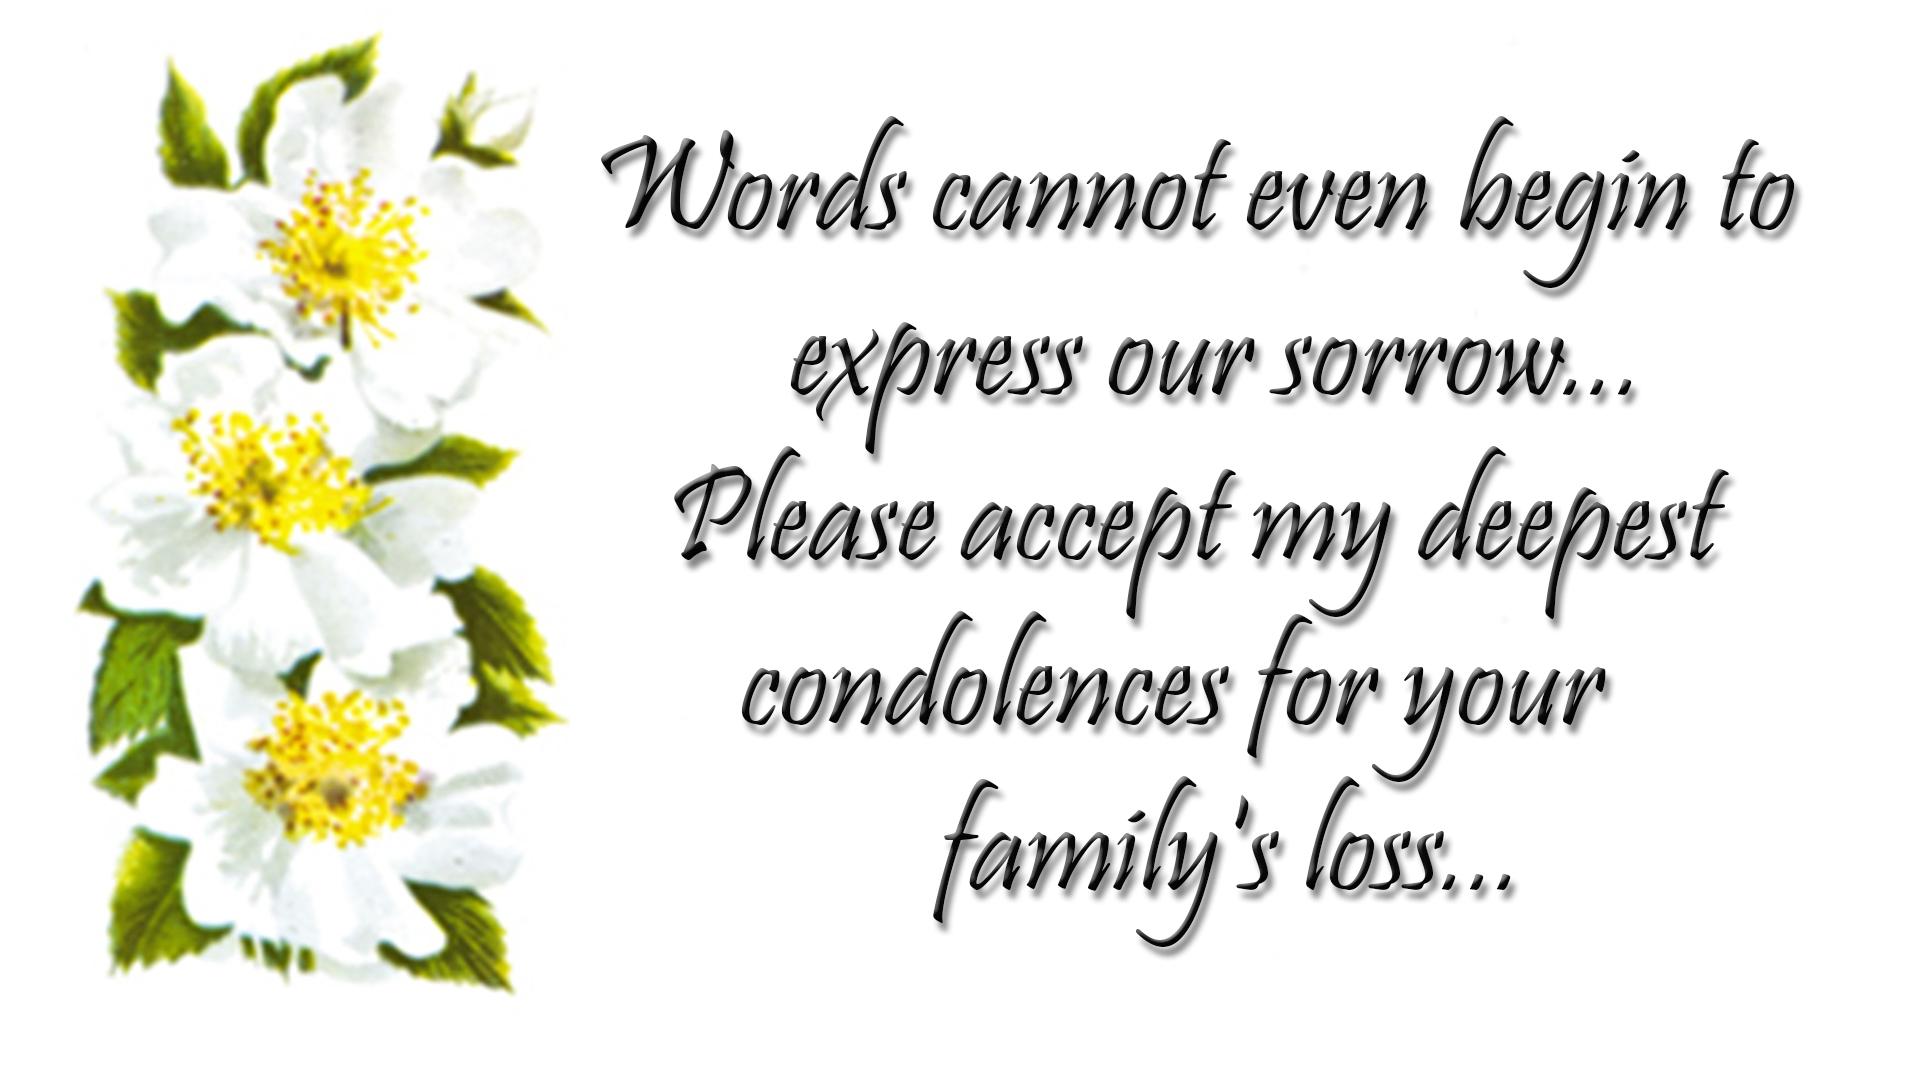 Sympathy Message   Condolences Quotes Sympathy Messages Images Free Download